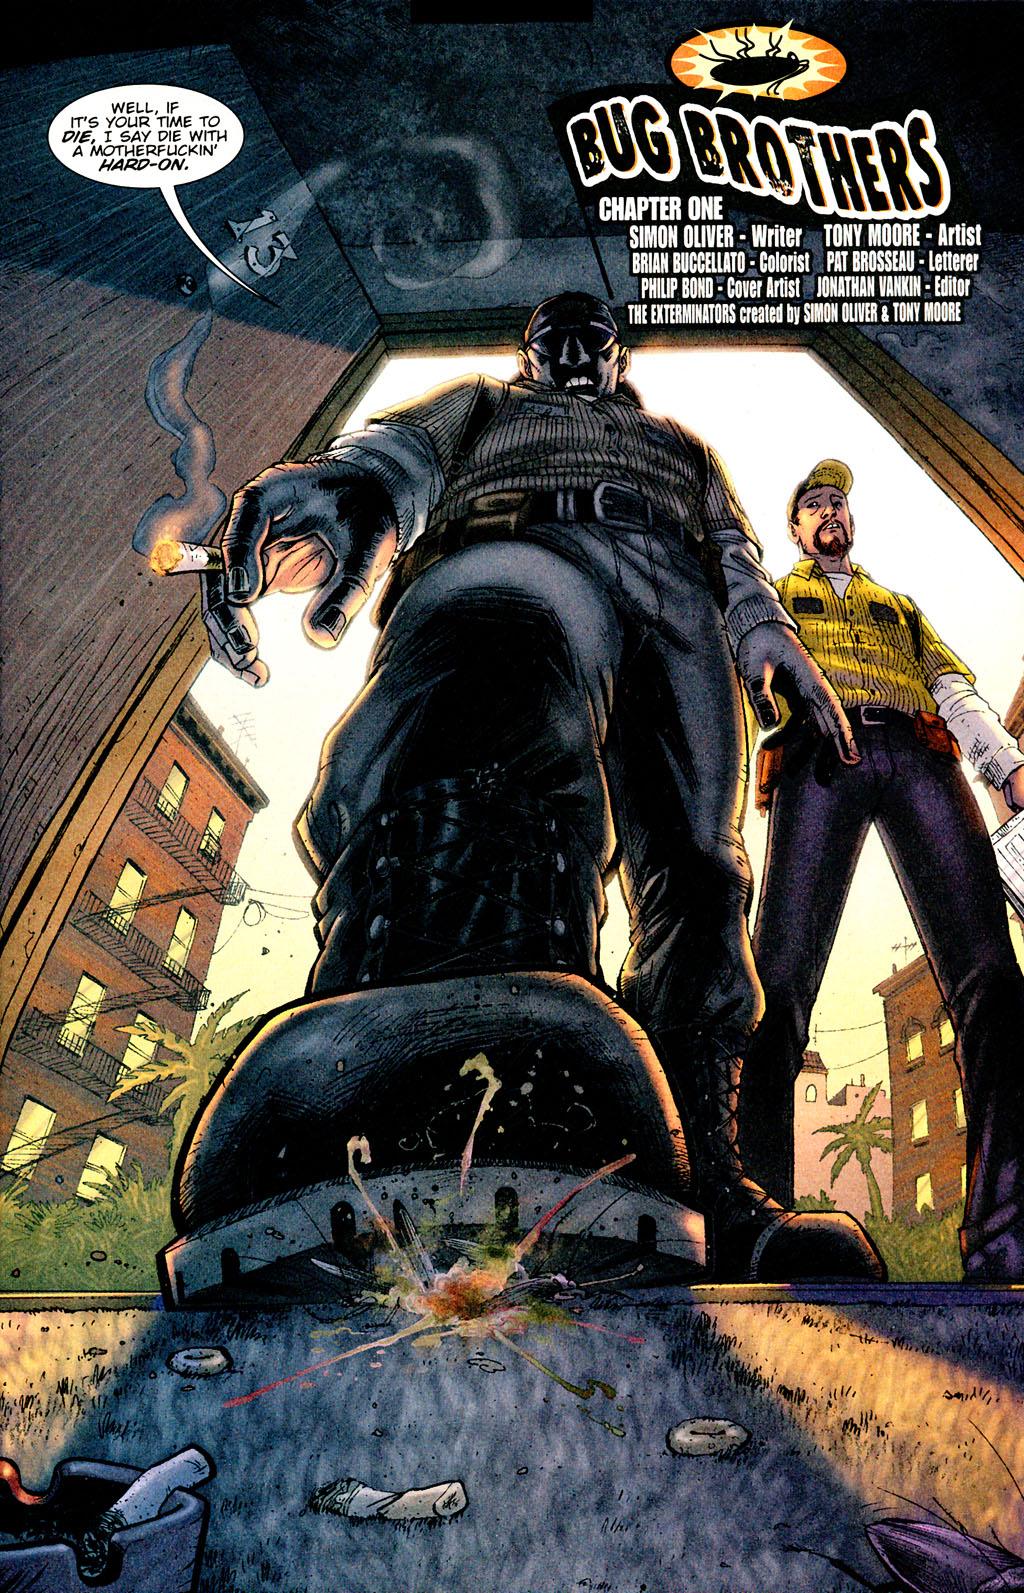 Read online The Exterminators comic -  Issue #1 - 4